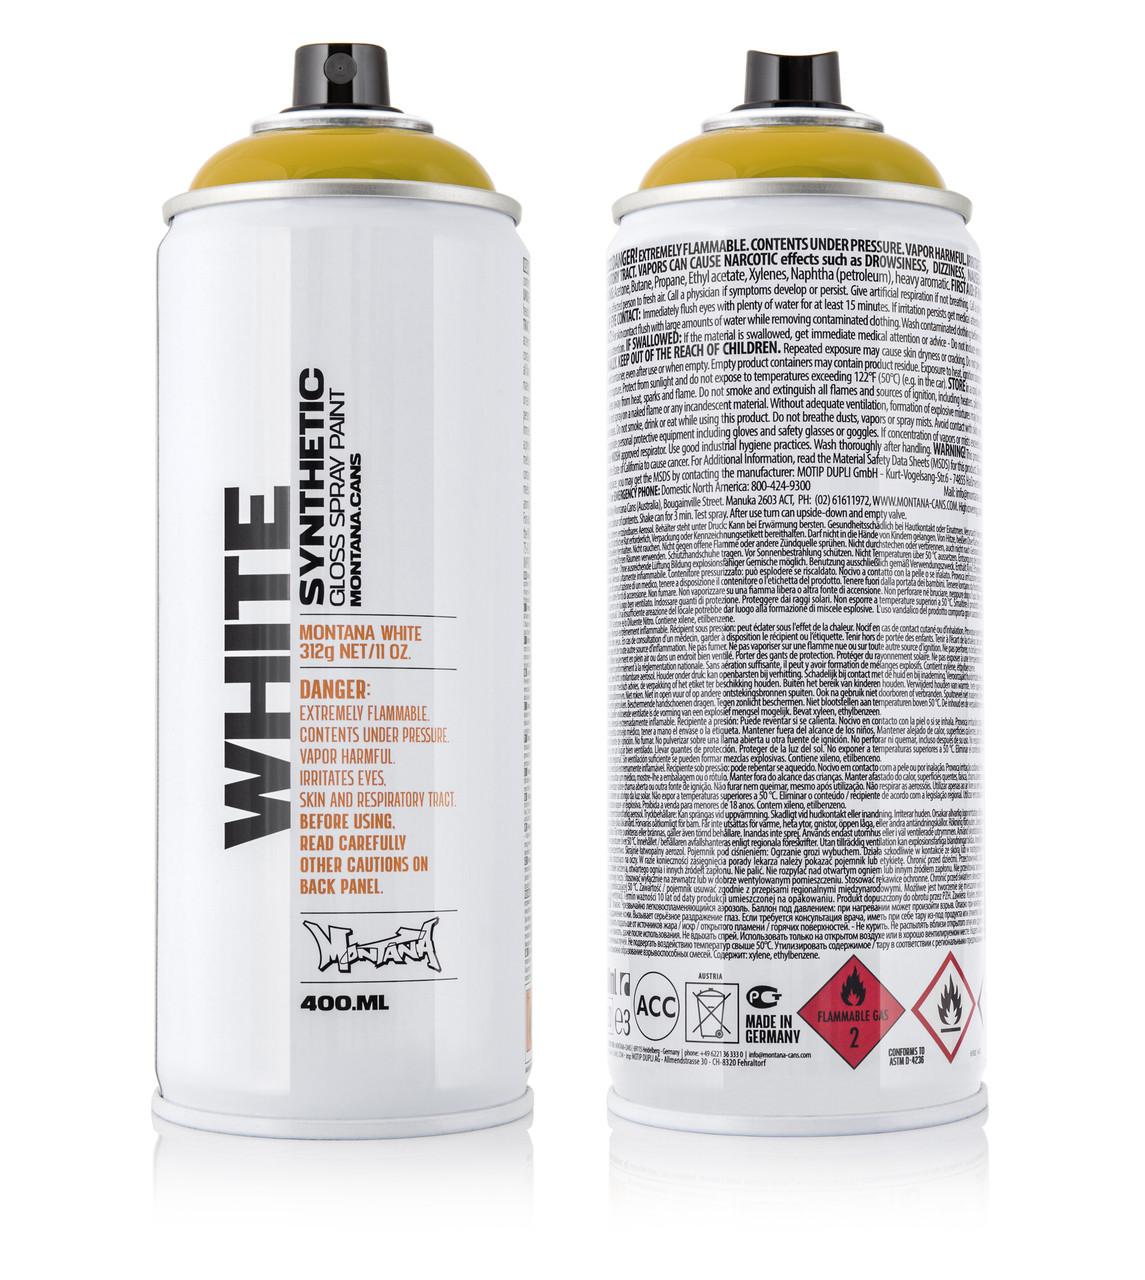 Краска Montana WHT1050 Охра 400 мл (Ochre) (280047)